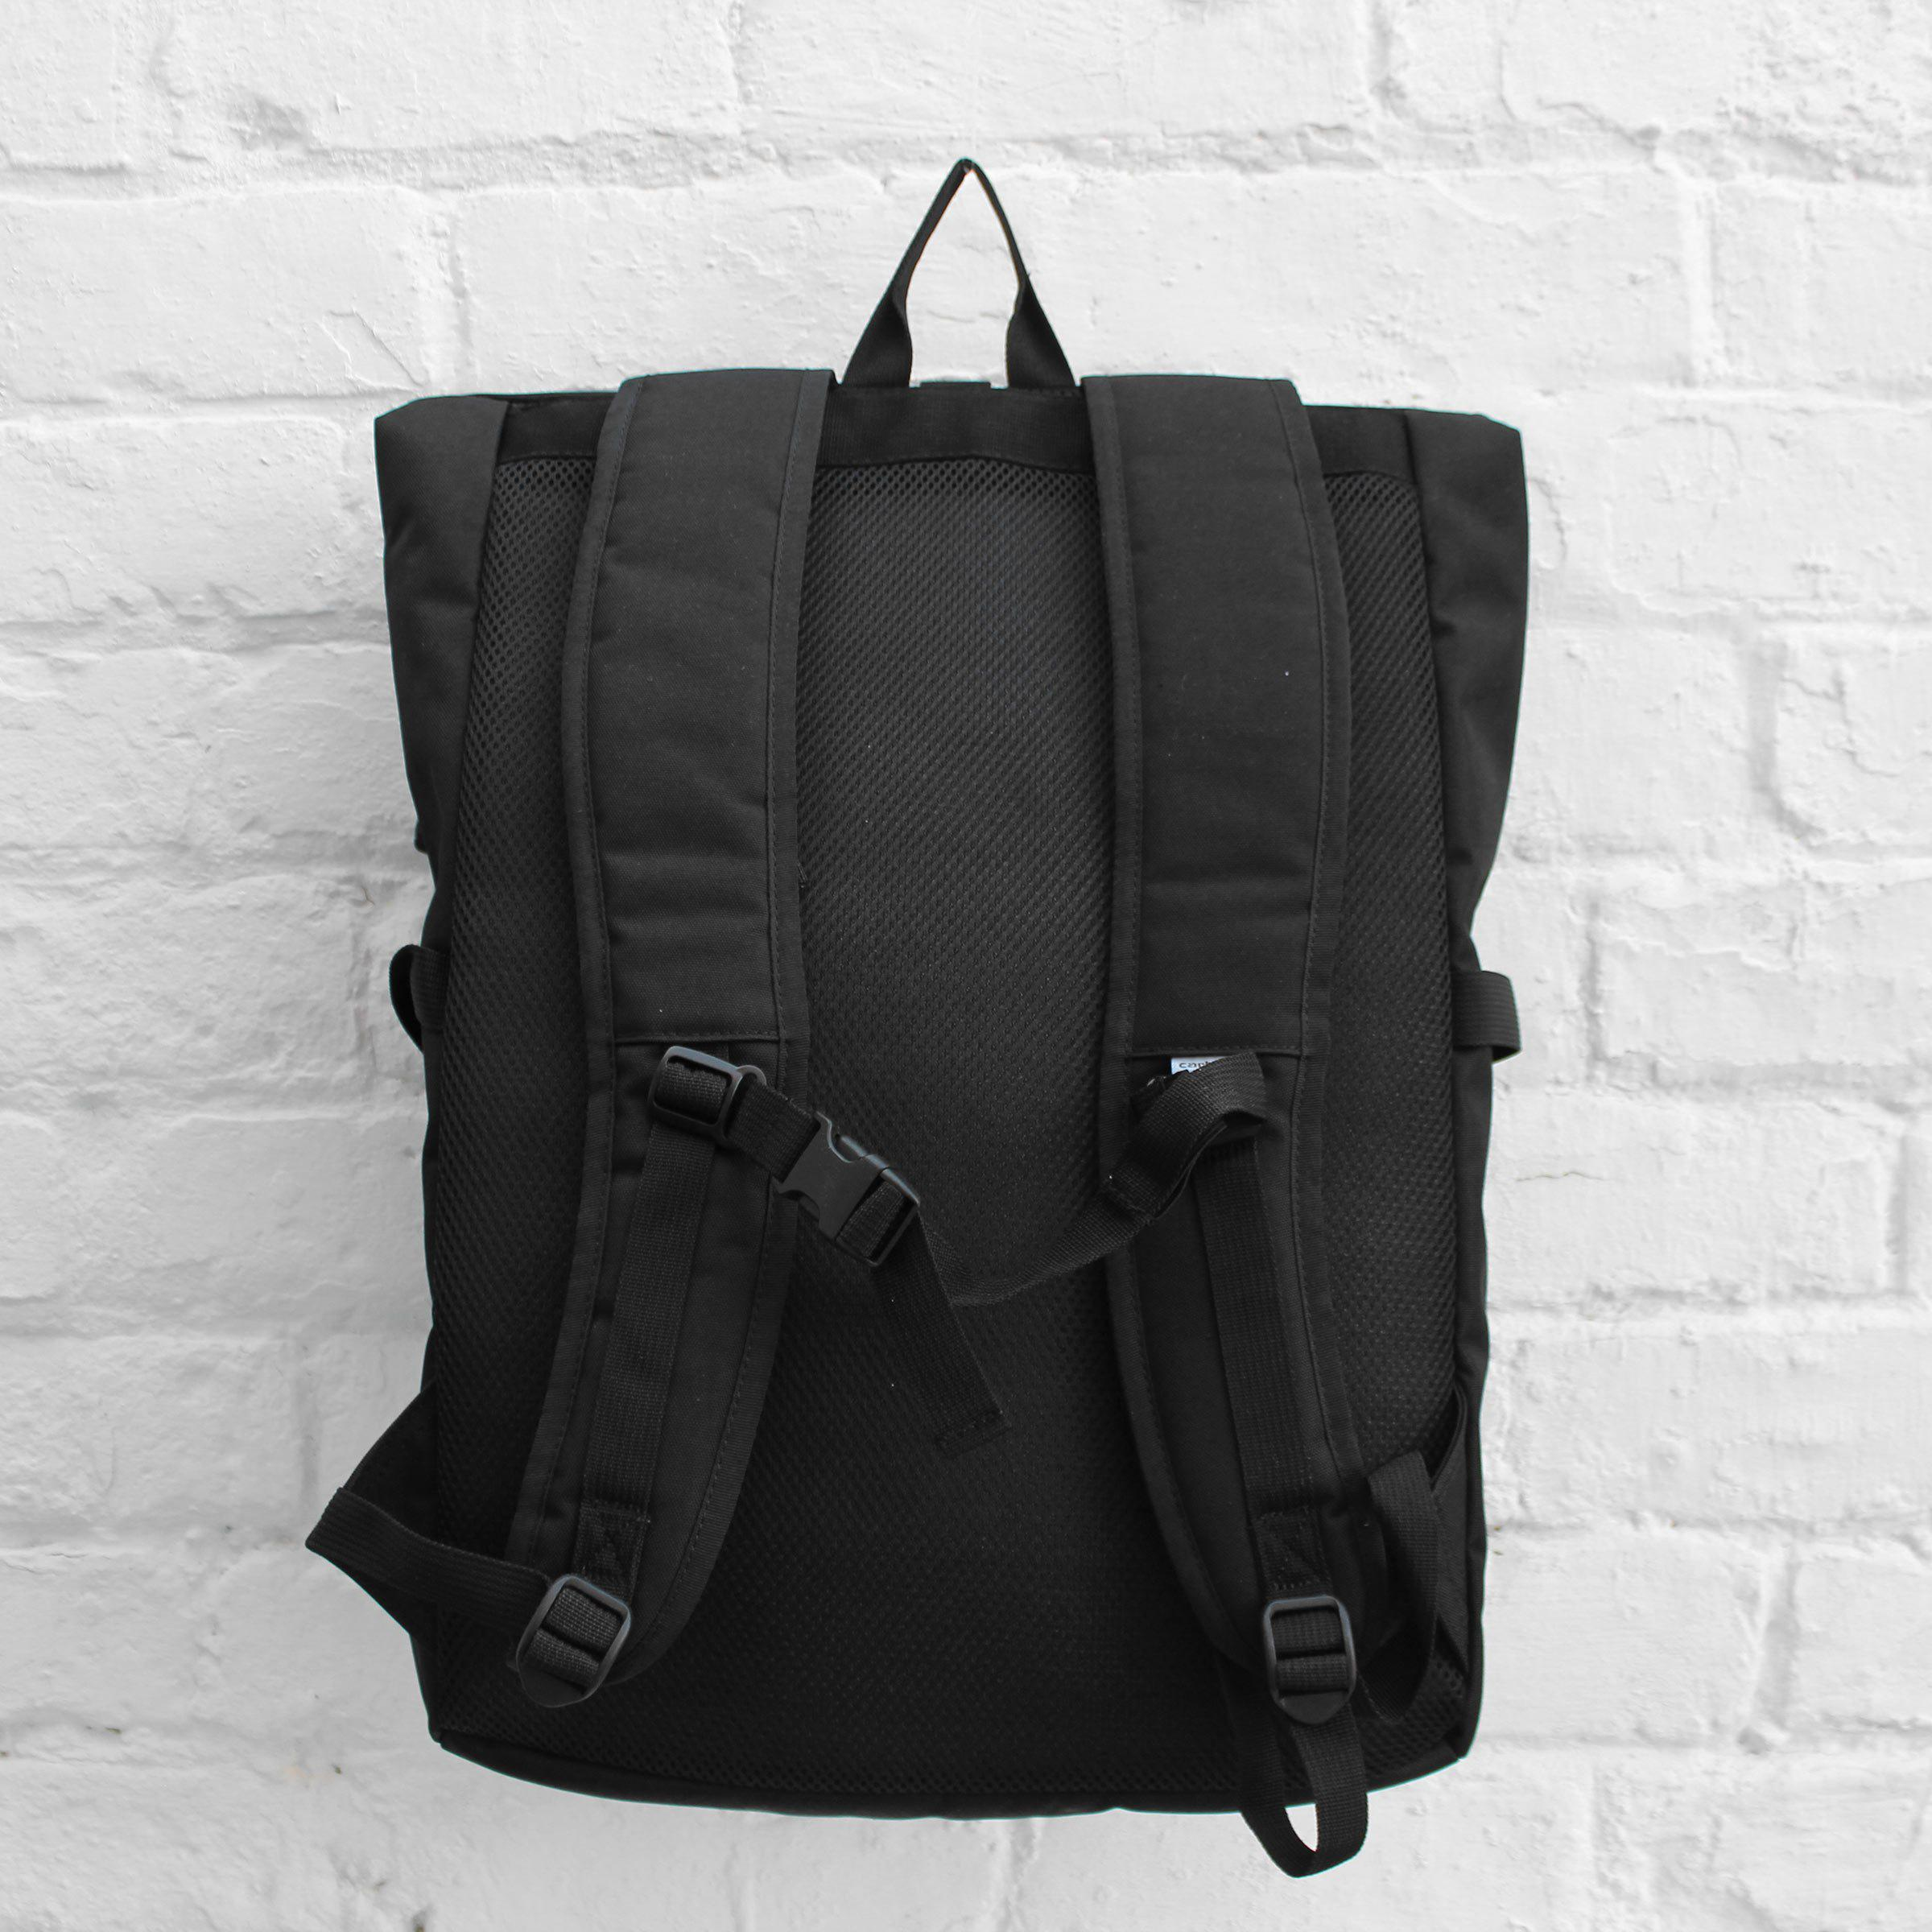 5ef5f9487e Carhartt Wip Phil Backpack in Black for Men - Lyst